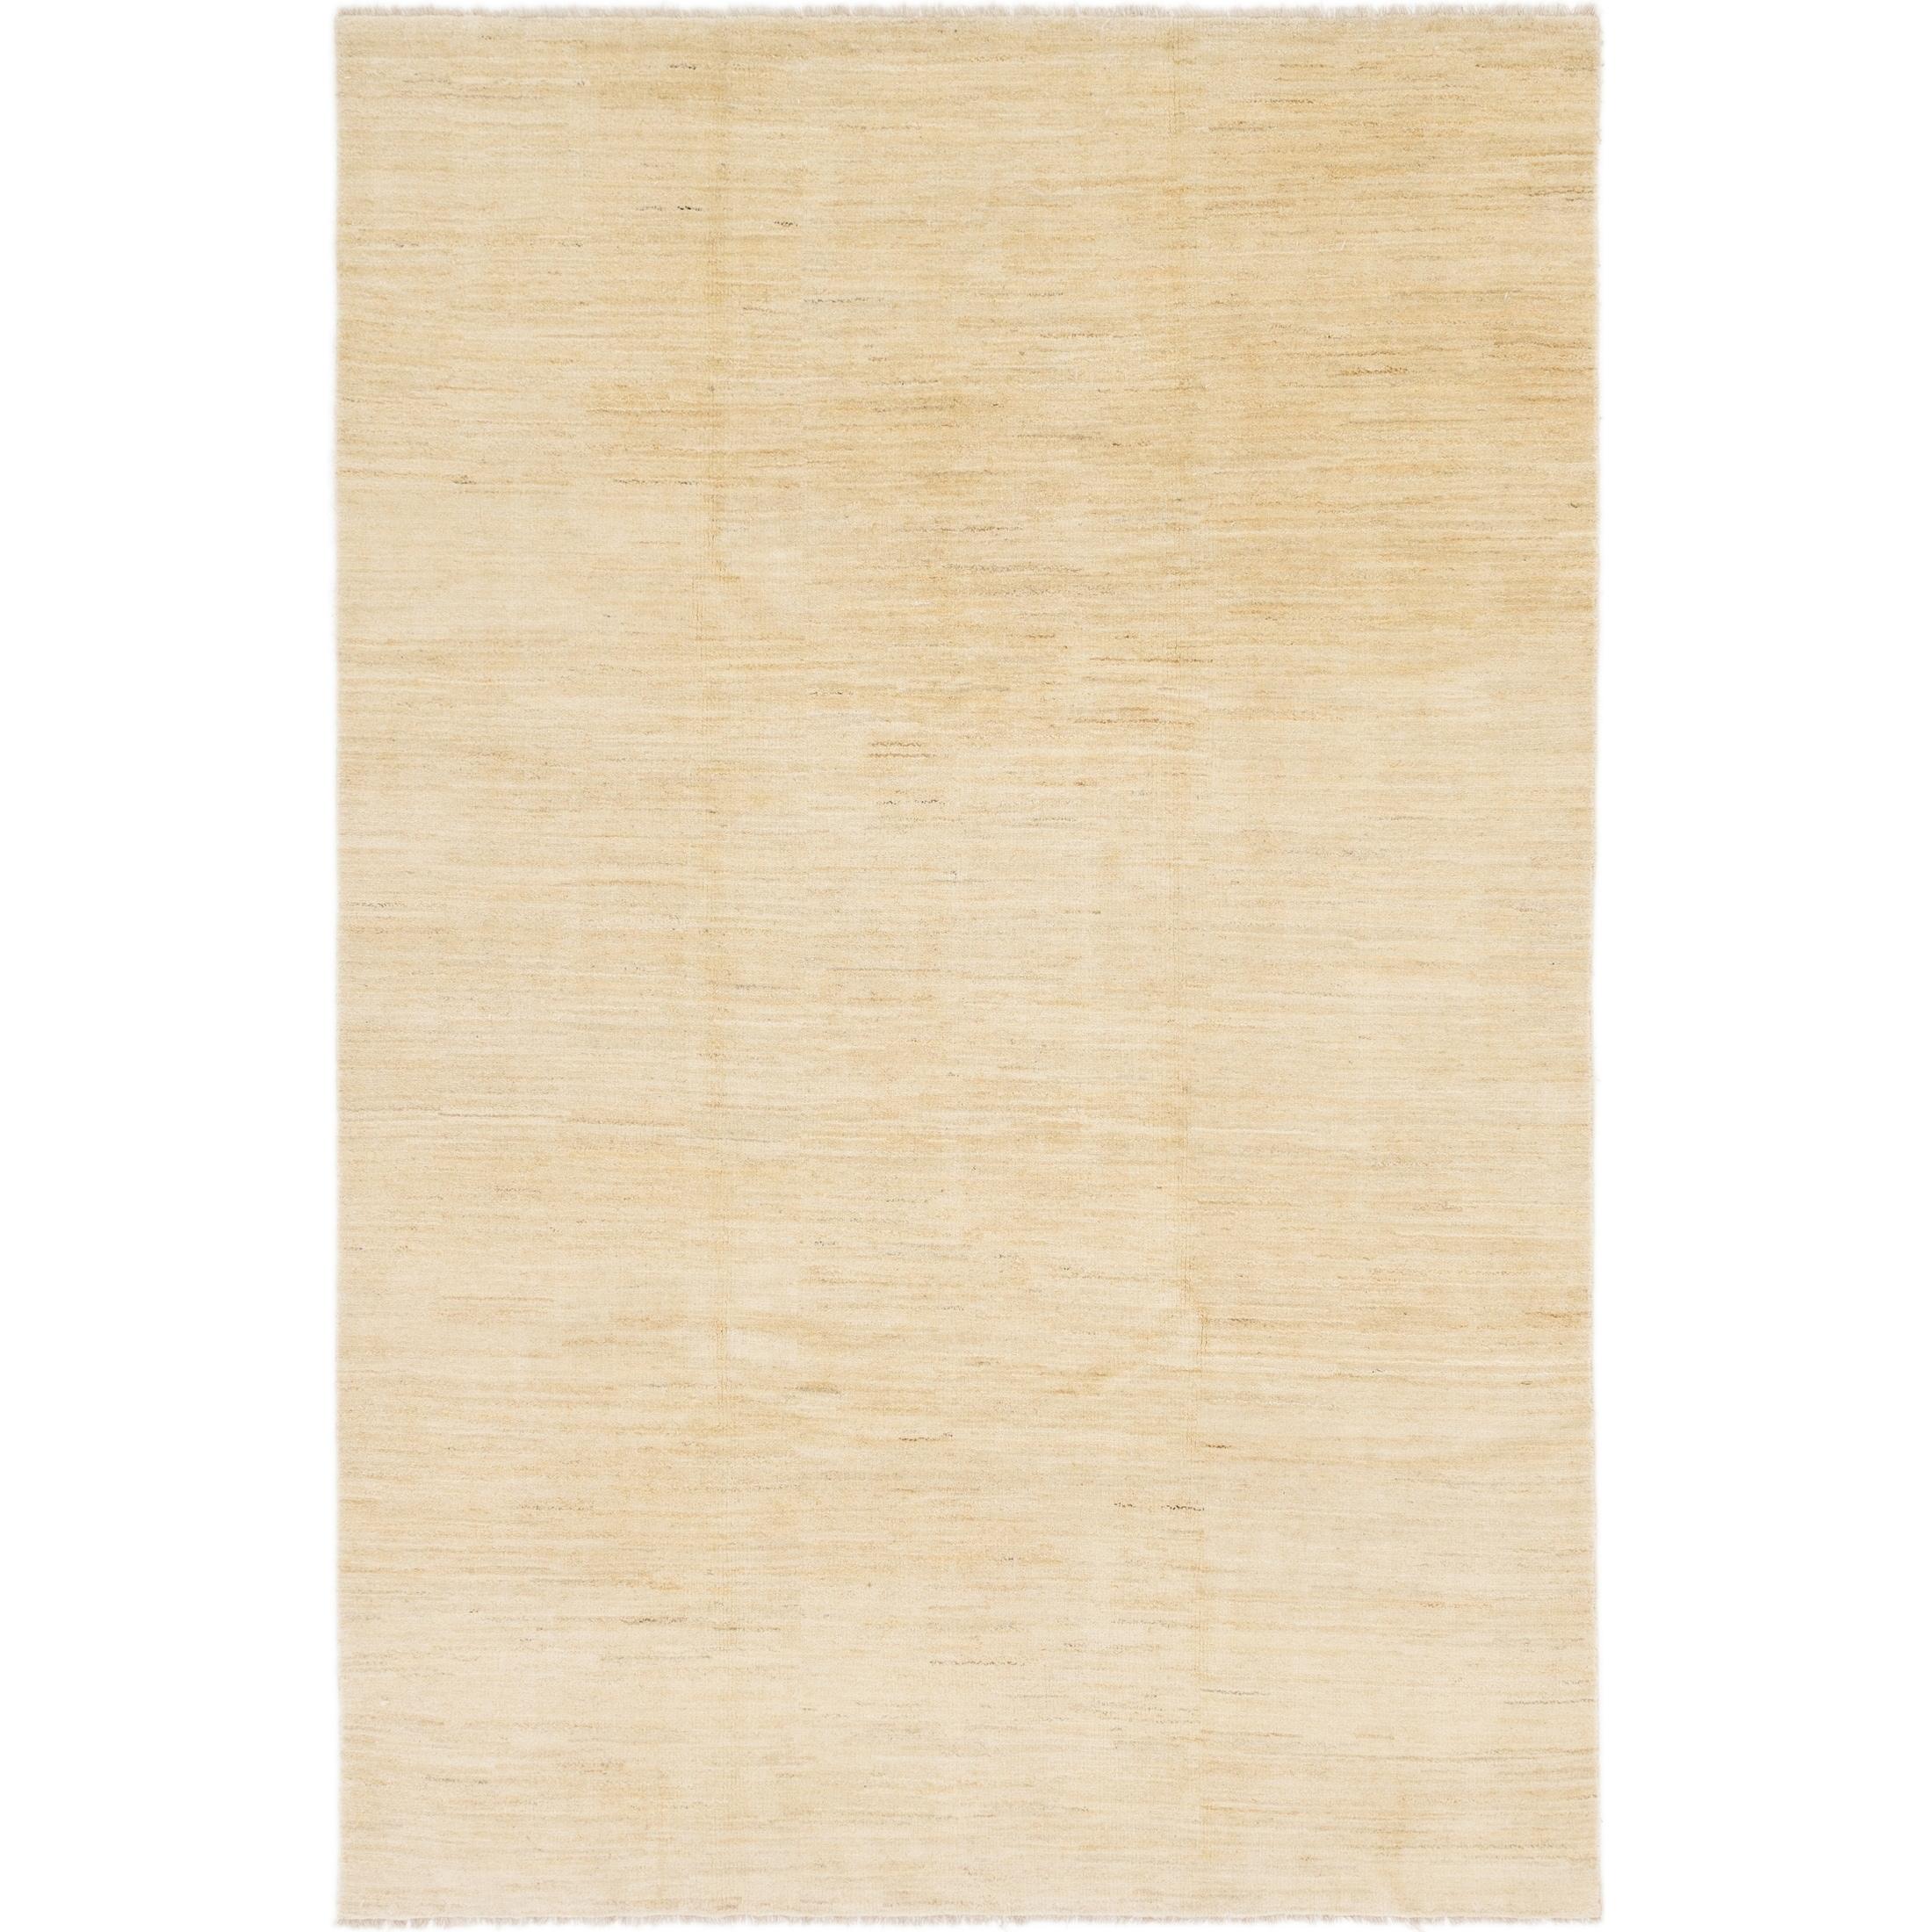 Hand Knotted Kashkuli Gabbeh Wool Area Rug - 6 7 x 9 10 (Beige - 6 7 x 9 10)